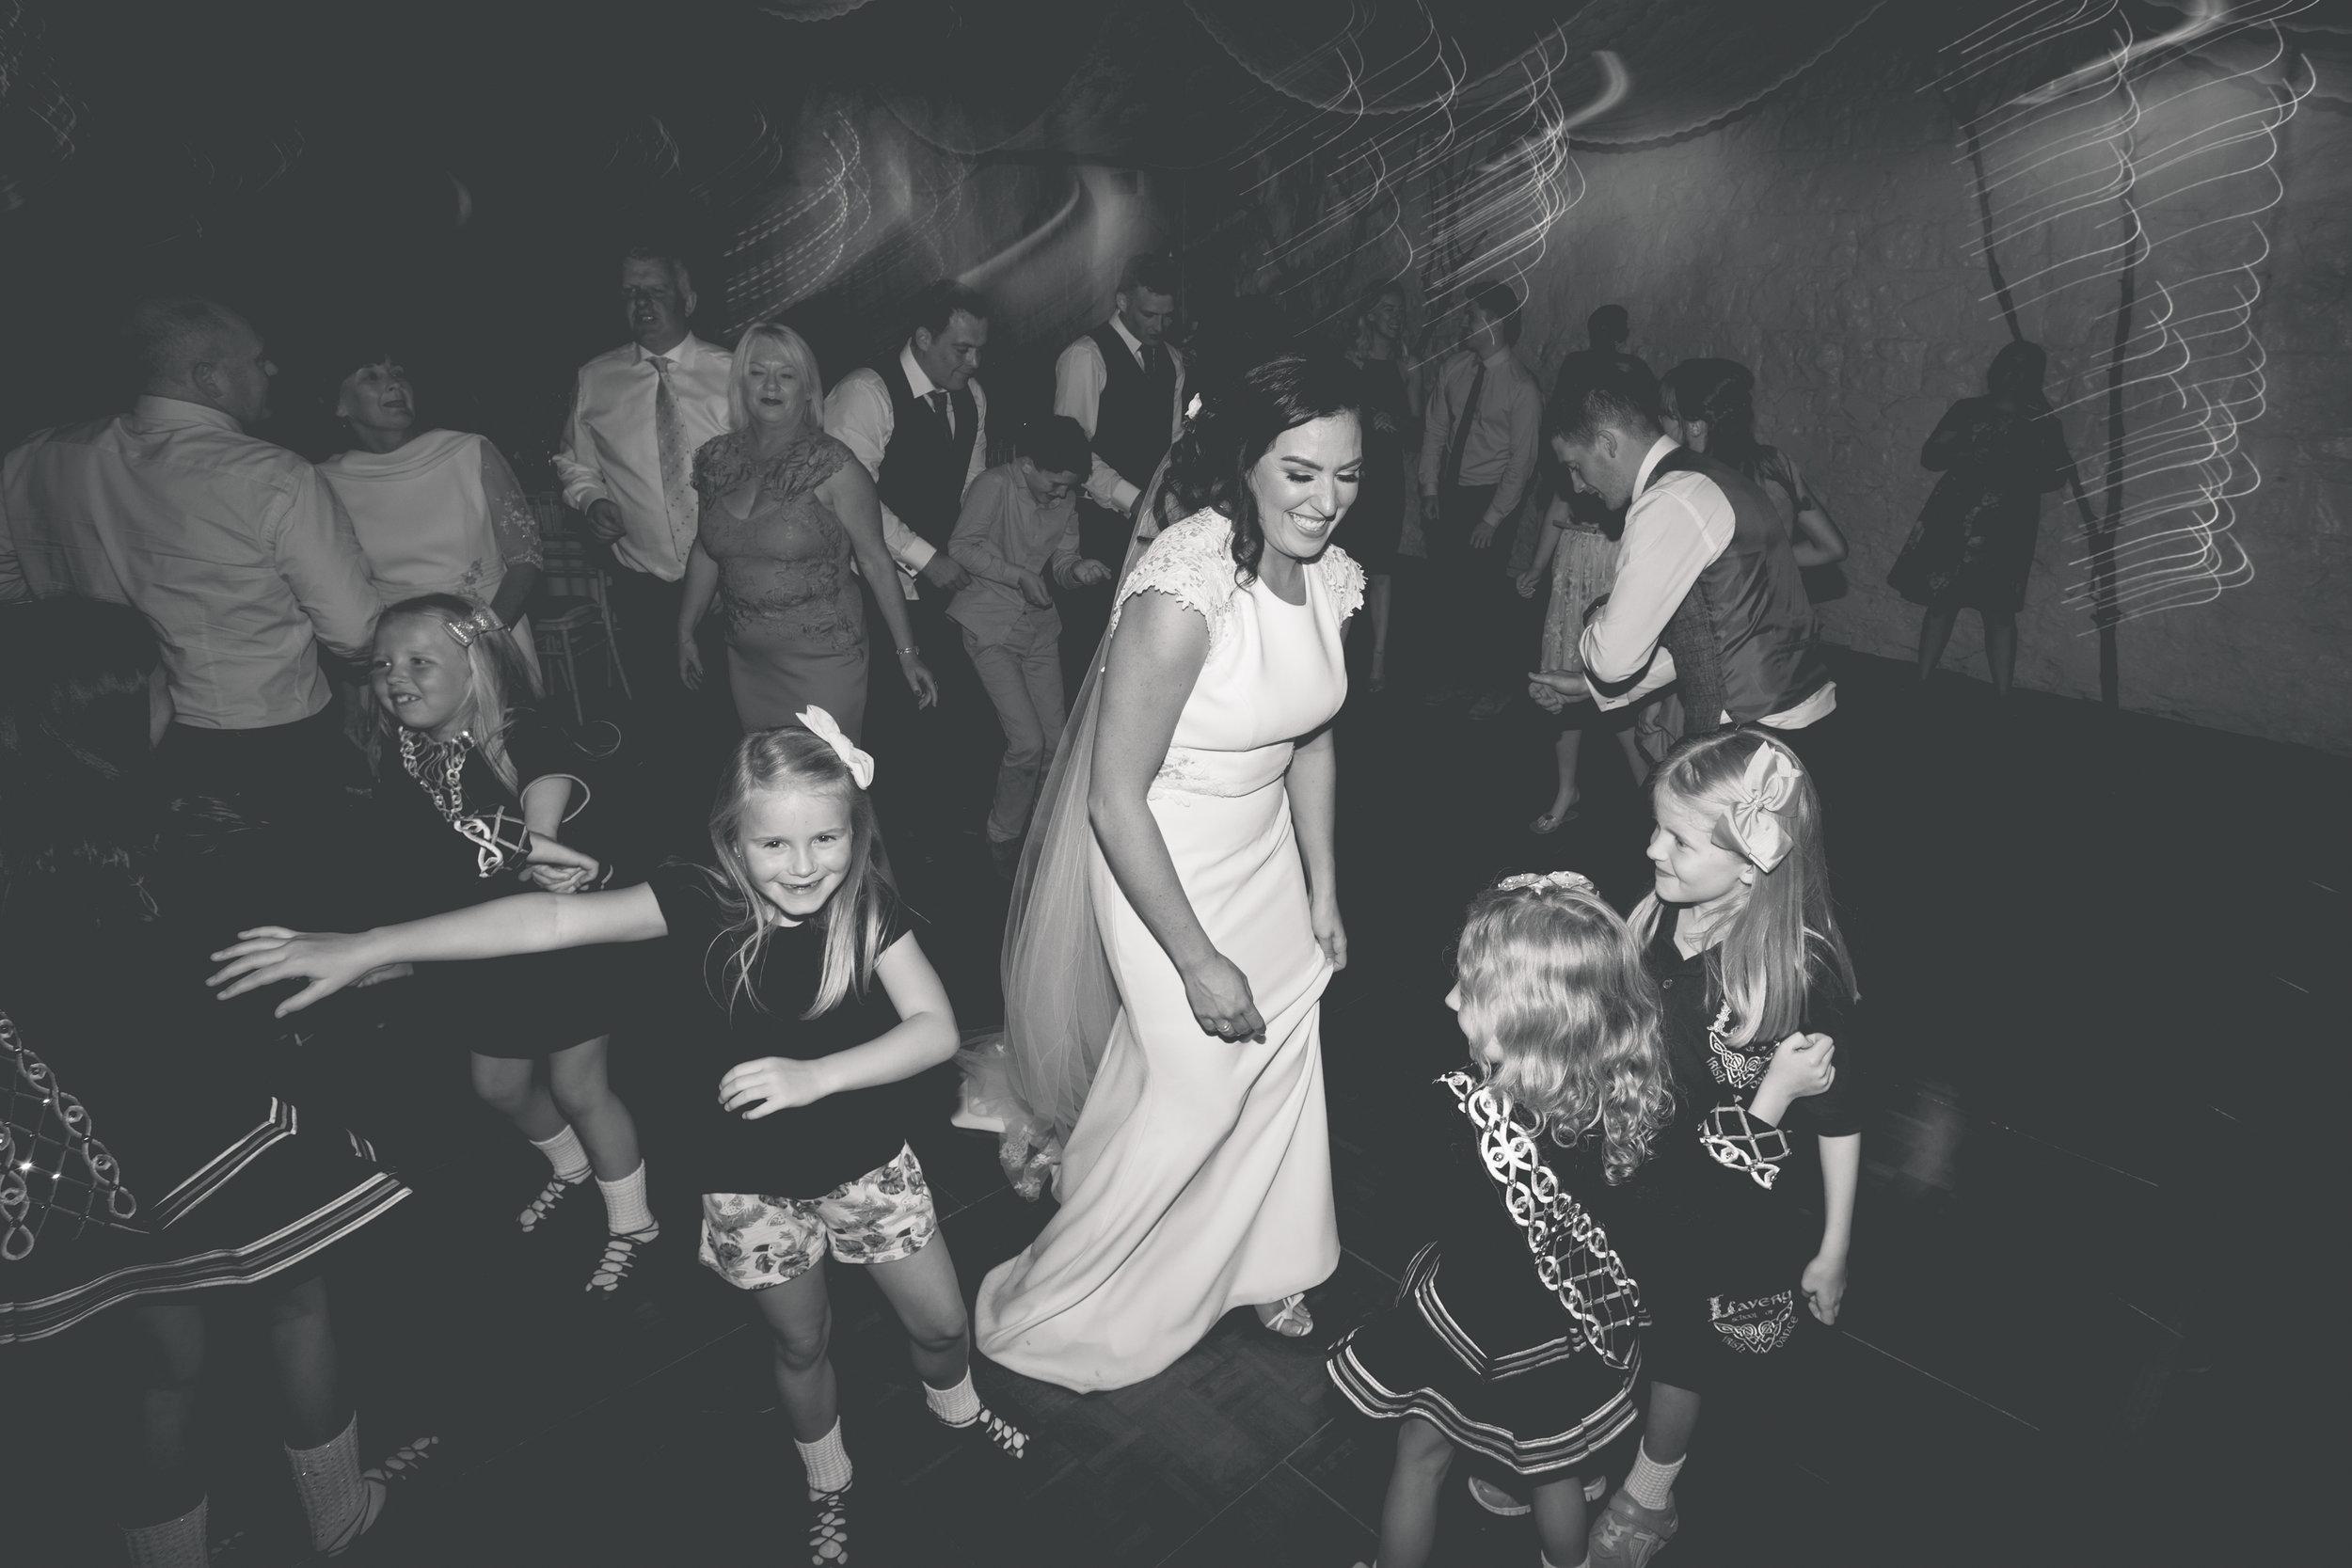 Brian McEwan Wedding Photography | Carol-Annee & Sean | The Dancing-75.jpg